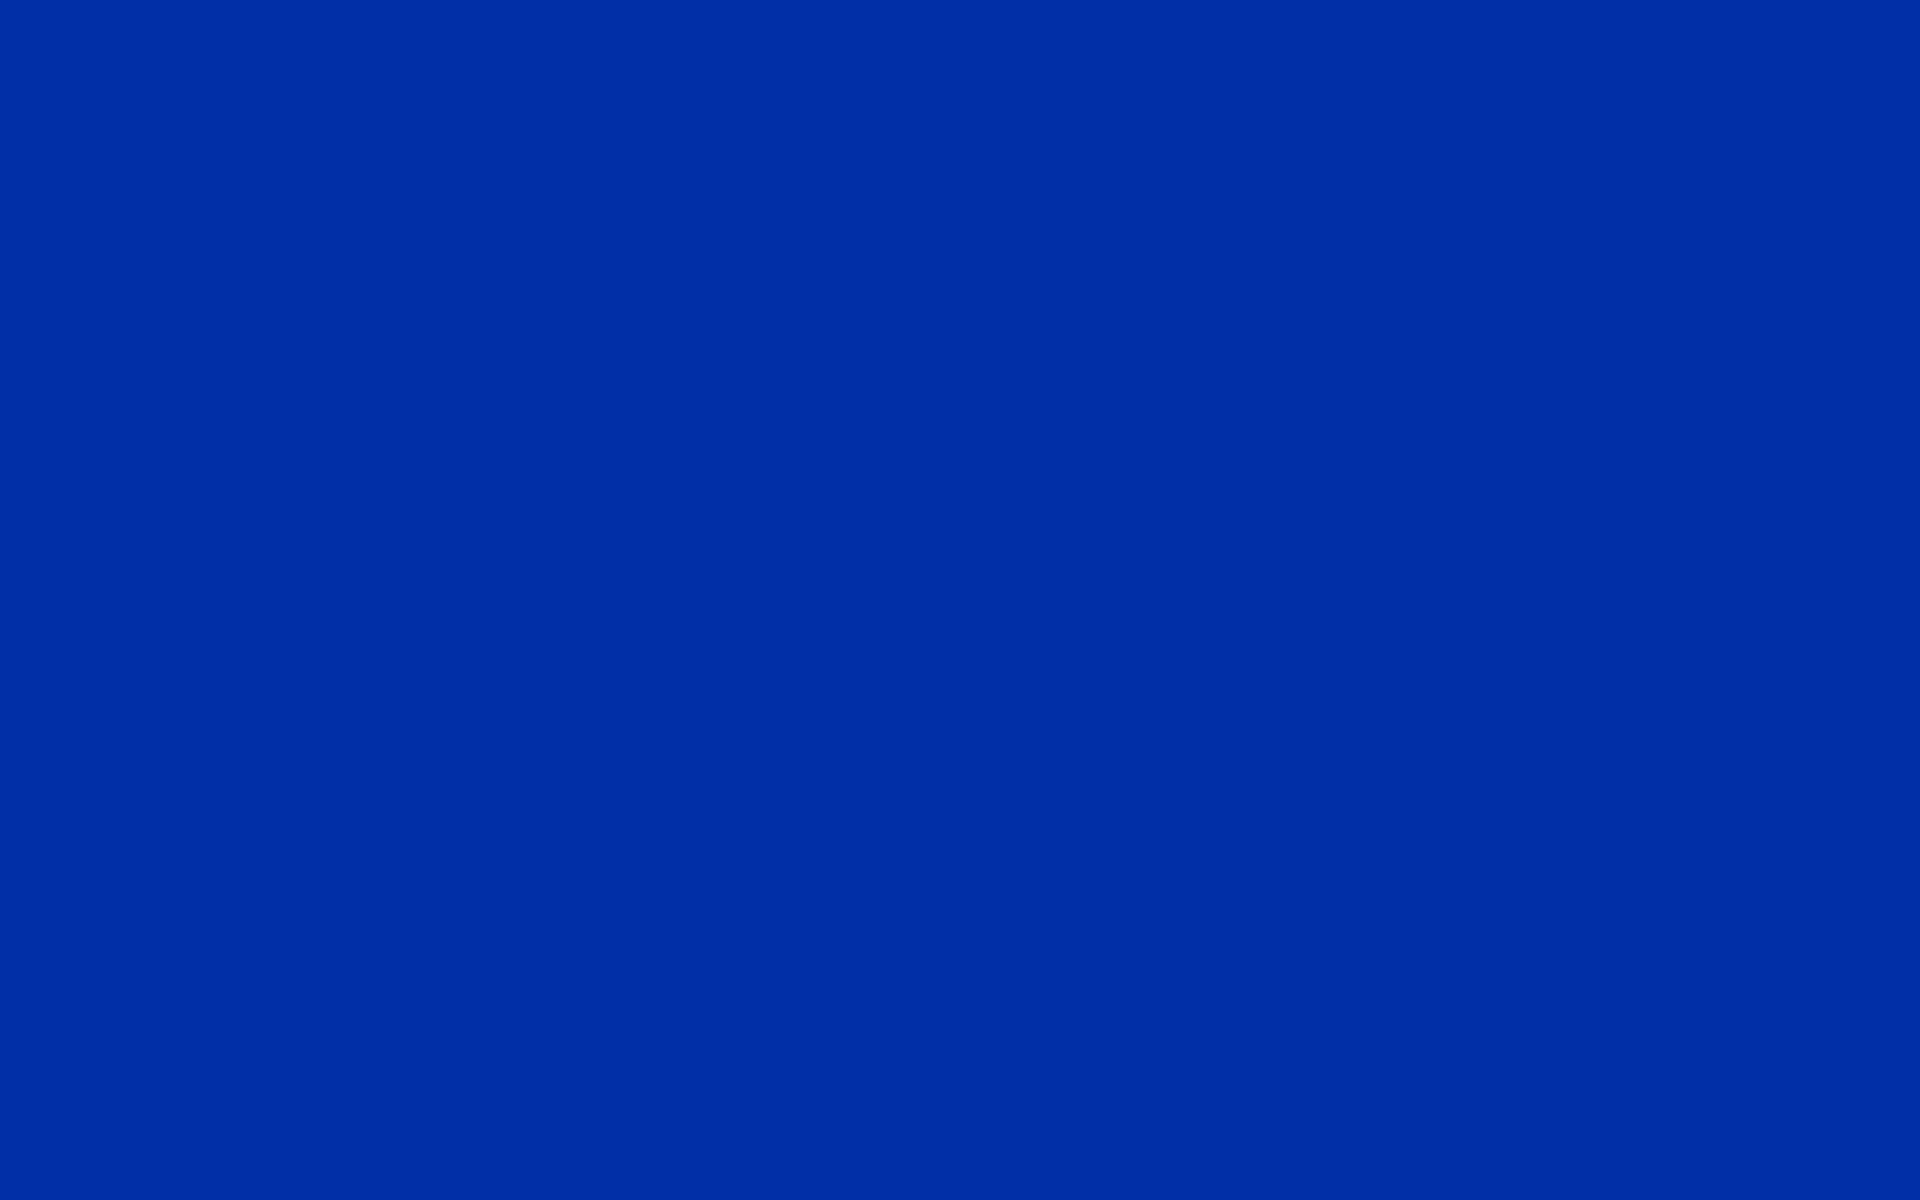 1920x1200 International Klein Blue Solid Color Background